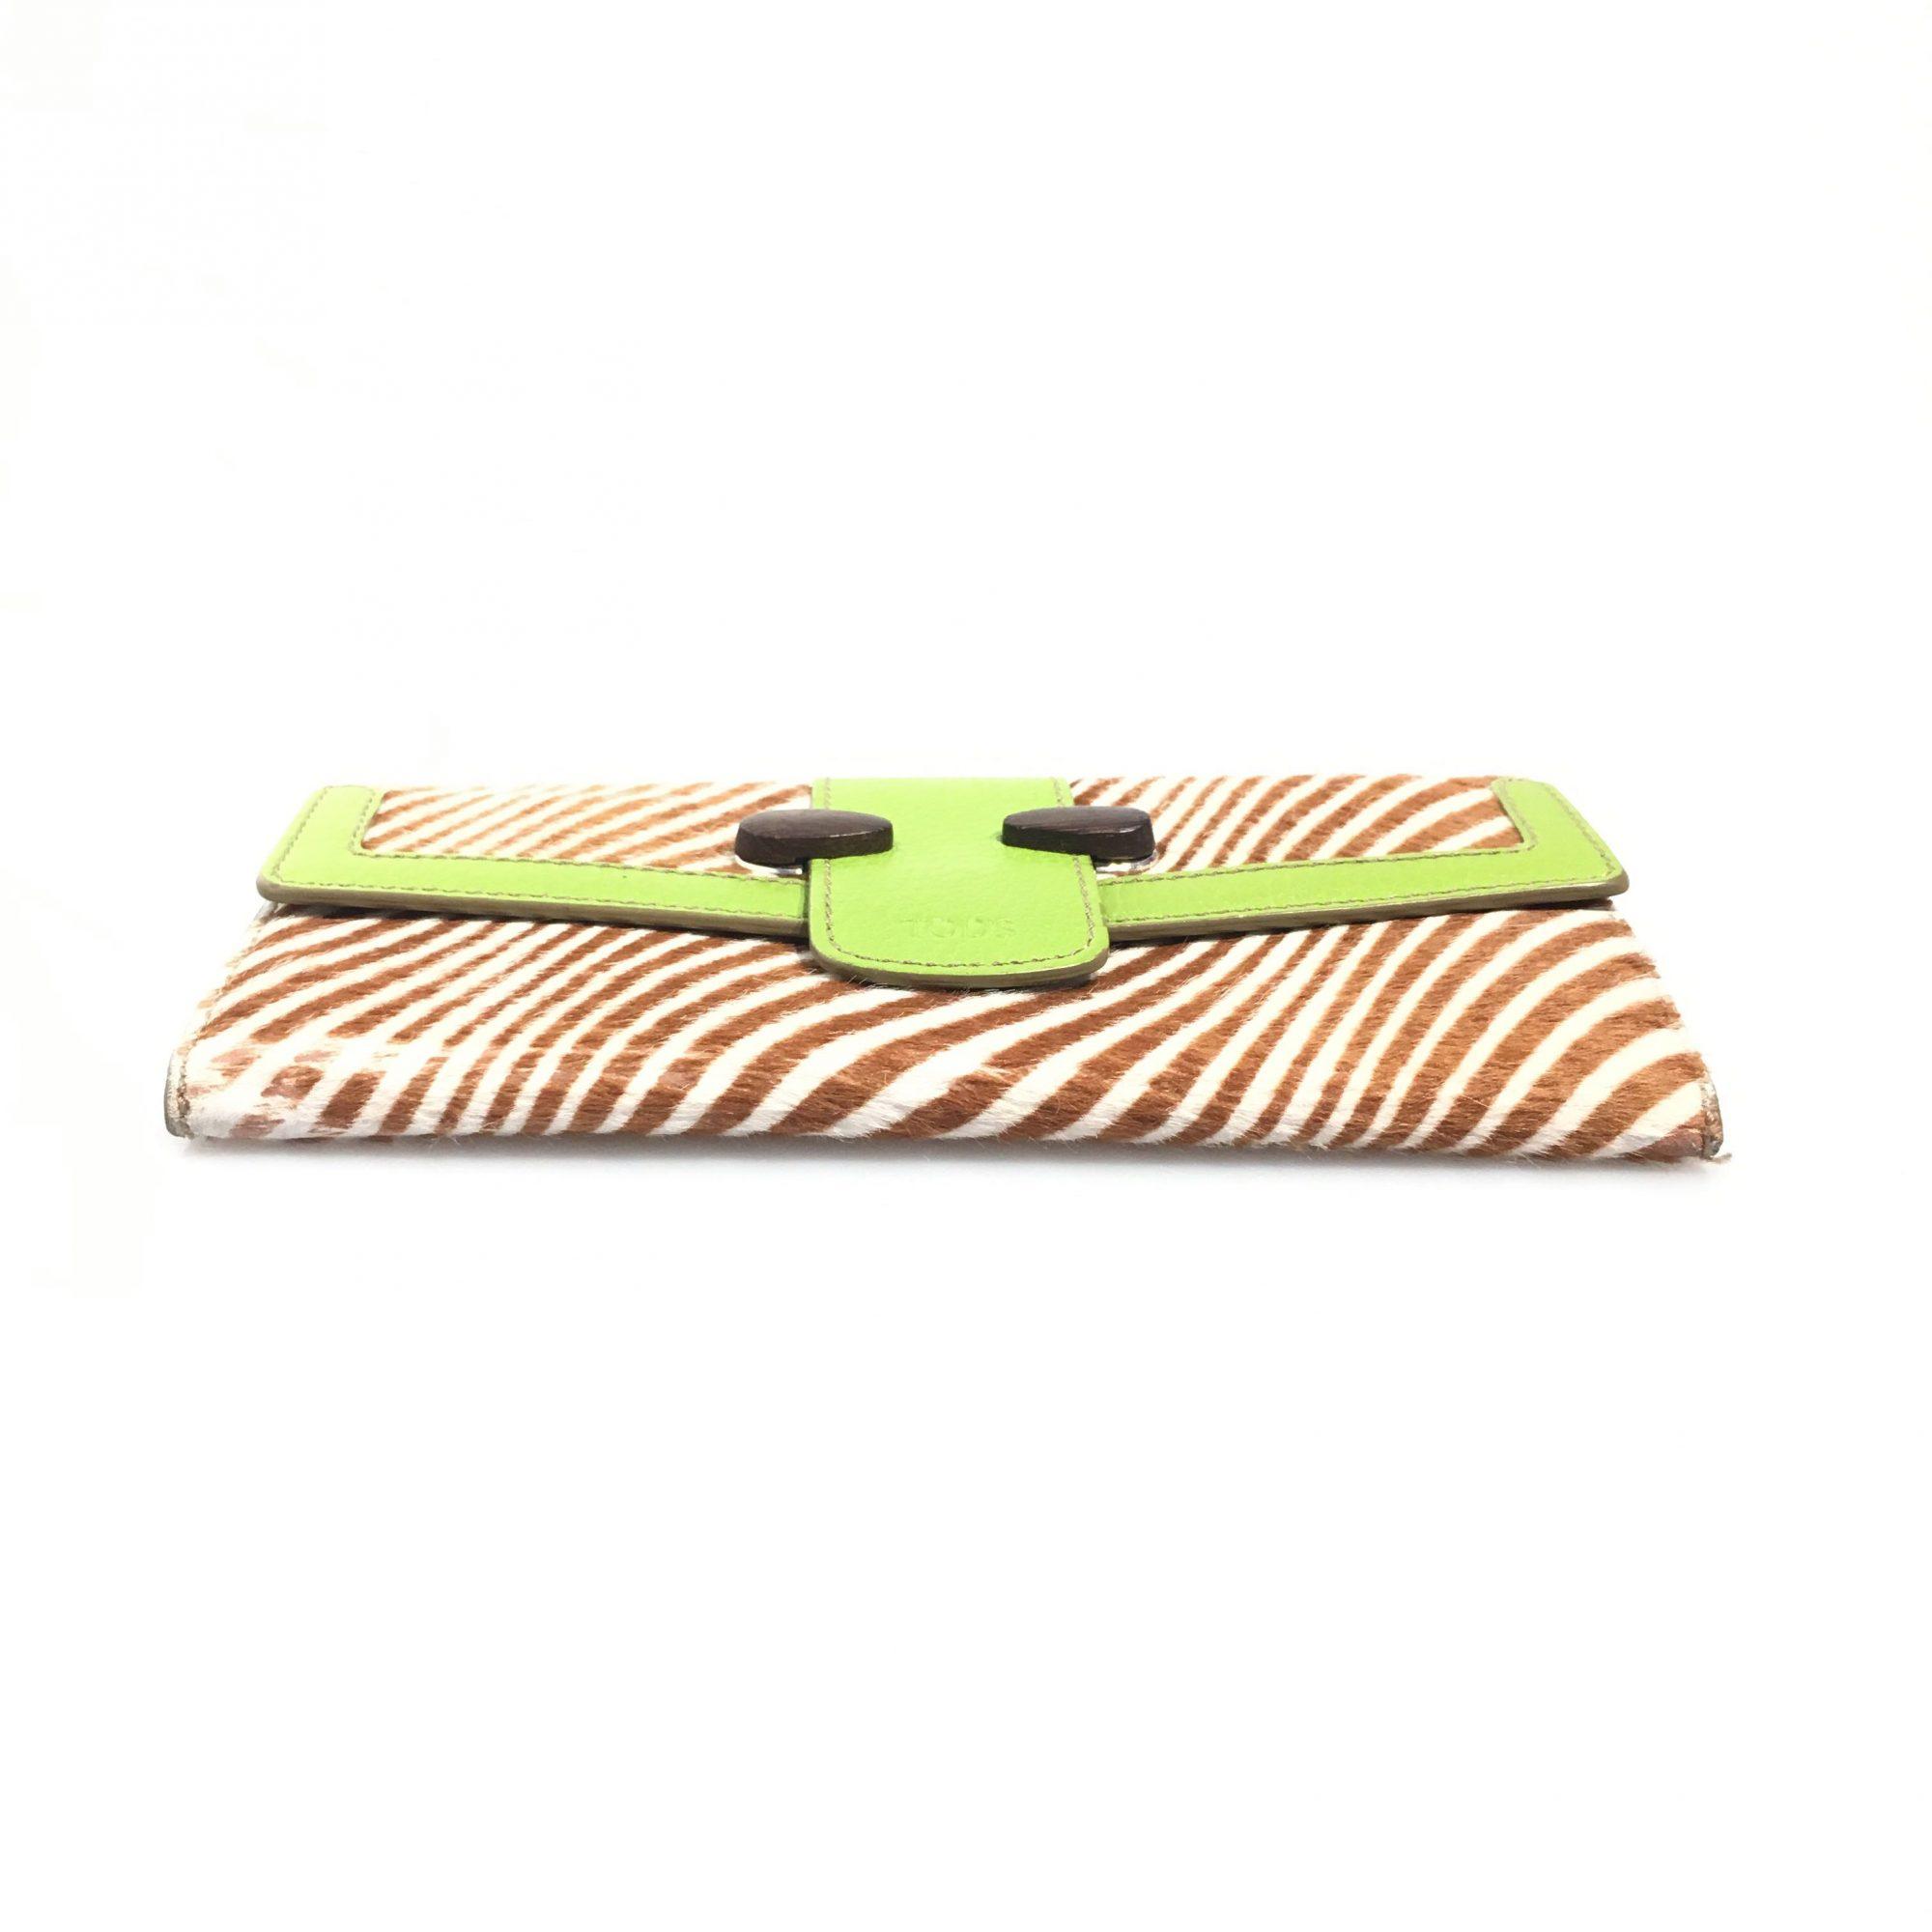 054b6e7c8e Tods Green Leather Calf Hair Long Wallet